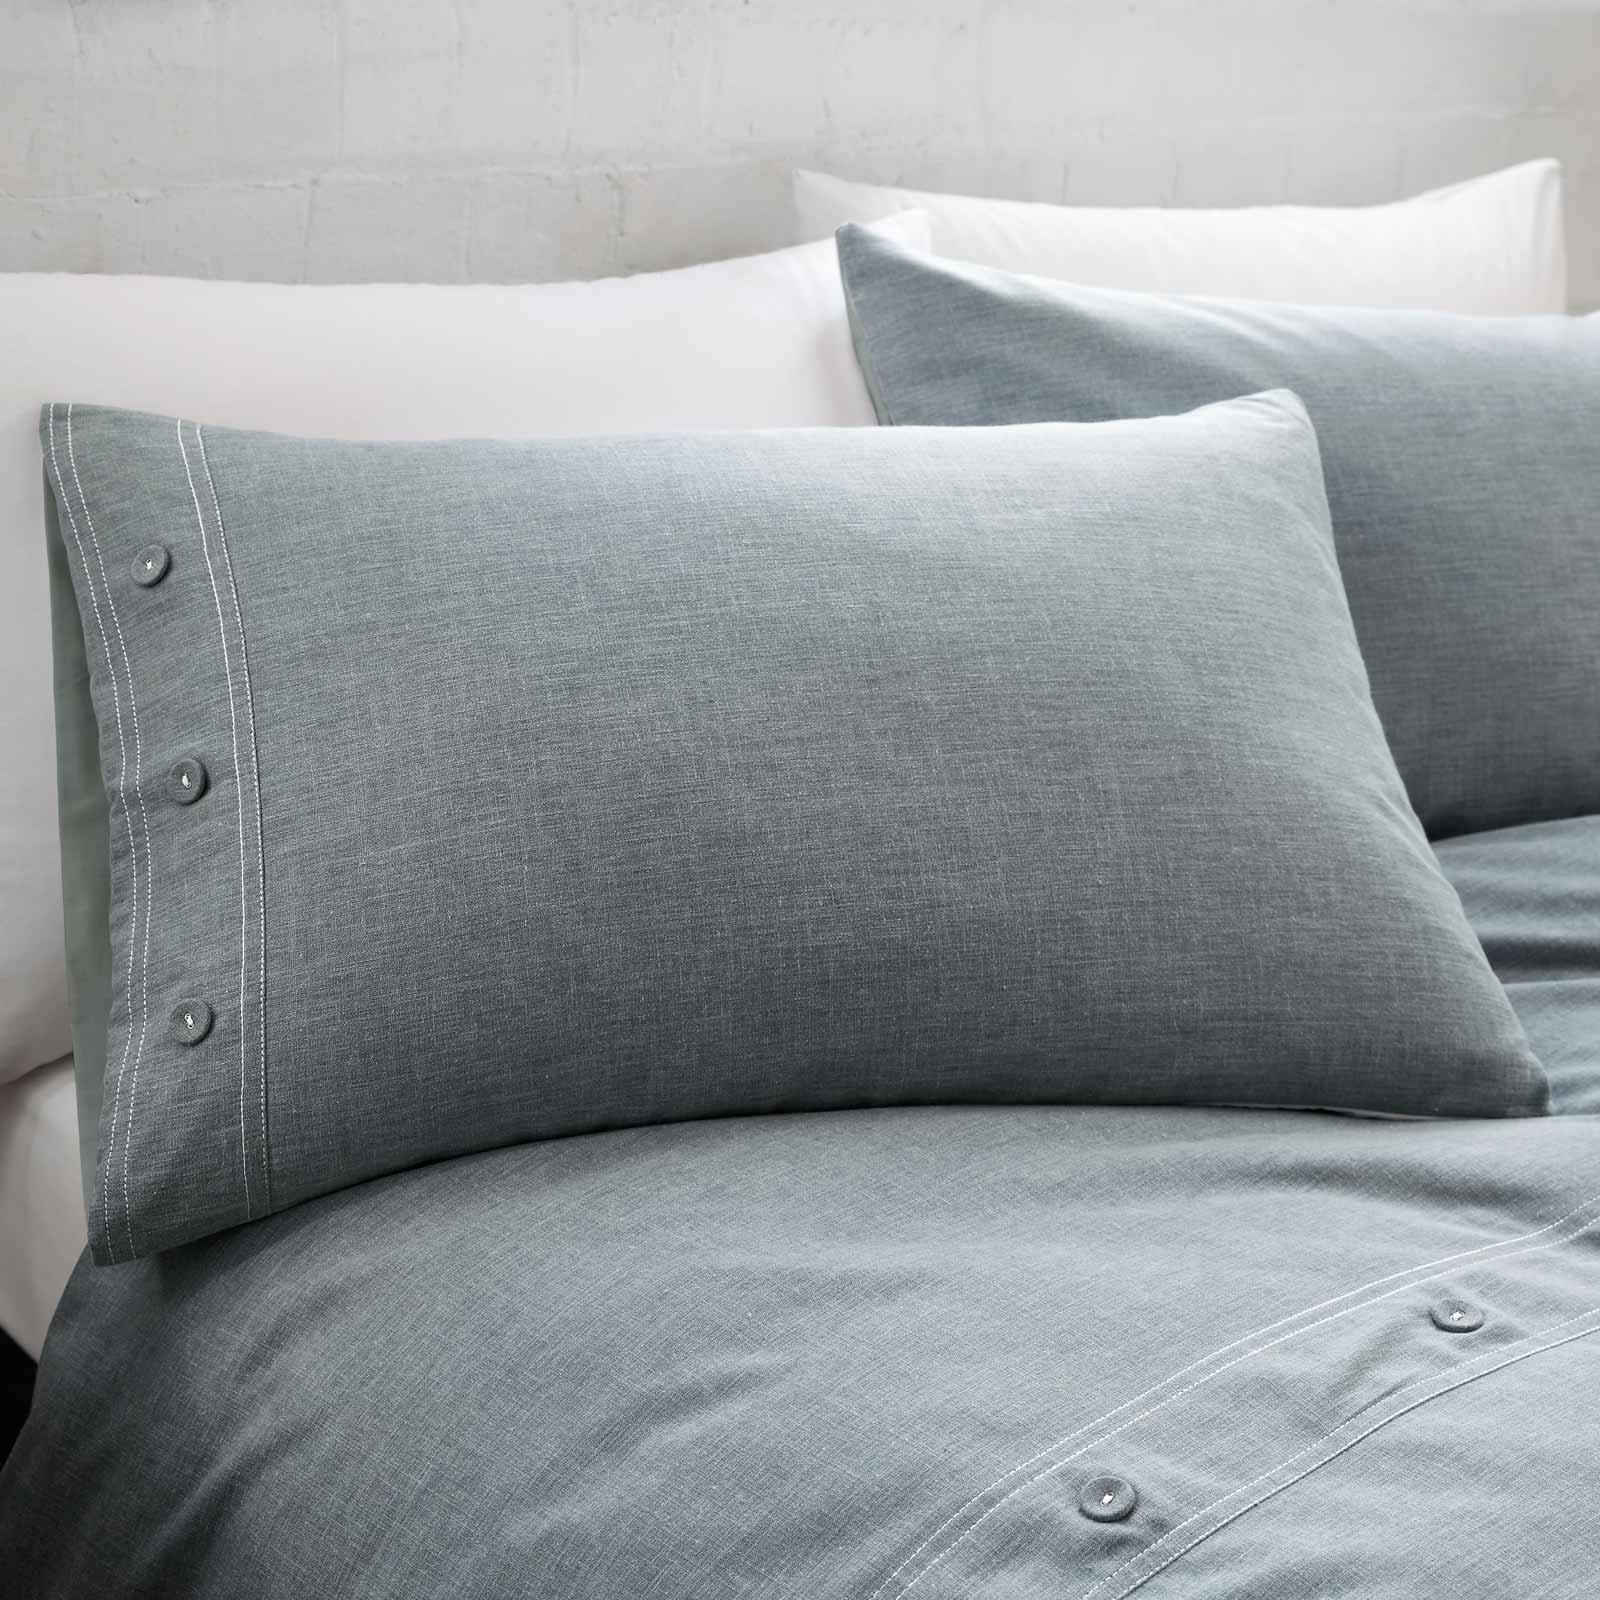 Azul-fundas-nordicas-Denim-Chambray-Boton-Detalle-de-lujo-cubierta-del-edredon-conjuntos-de-cama miniatura 21